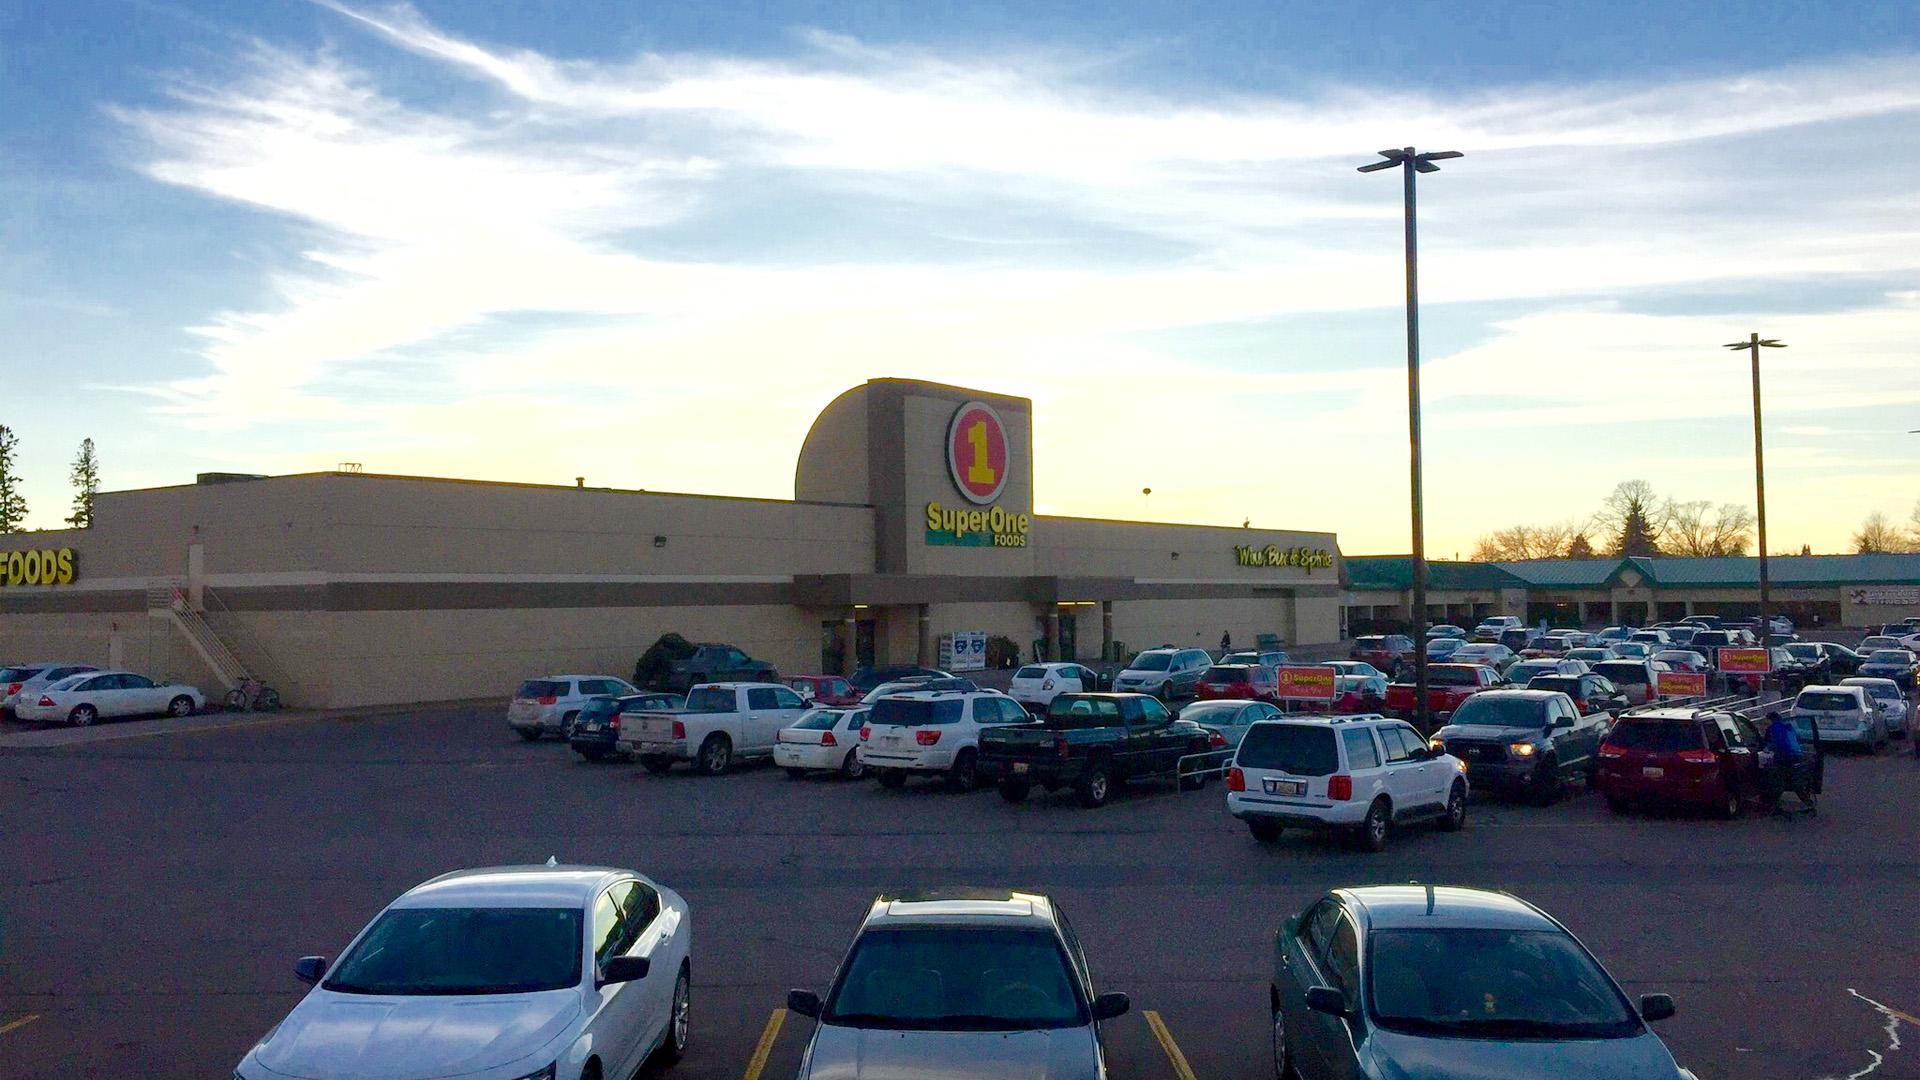 Midtown Retail Shoppng Mall Iron Mountain MI exterior featuring Super One Foods